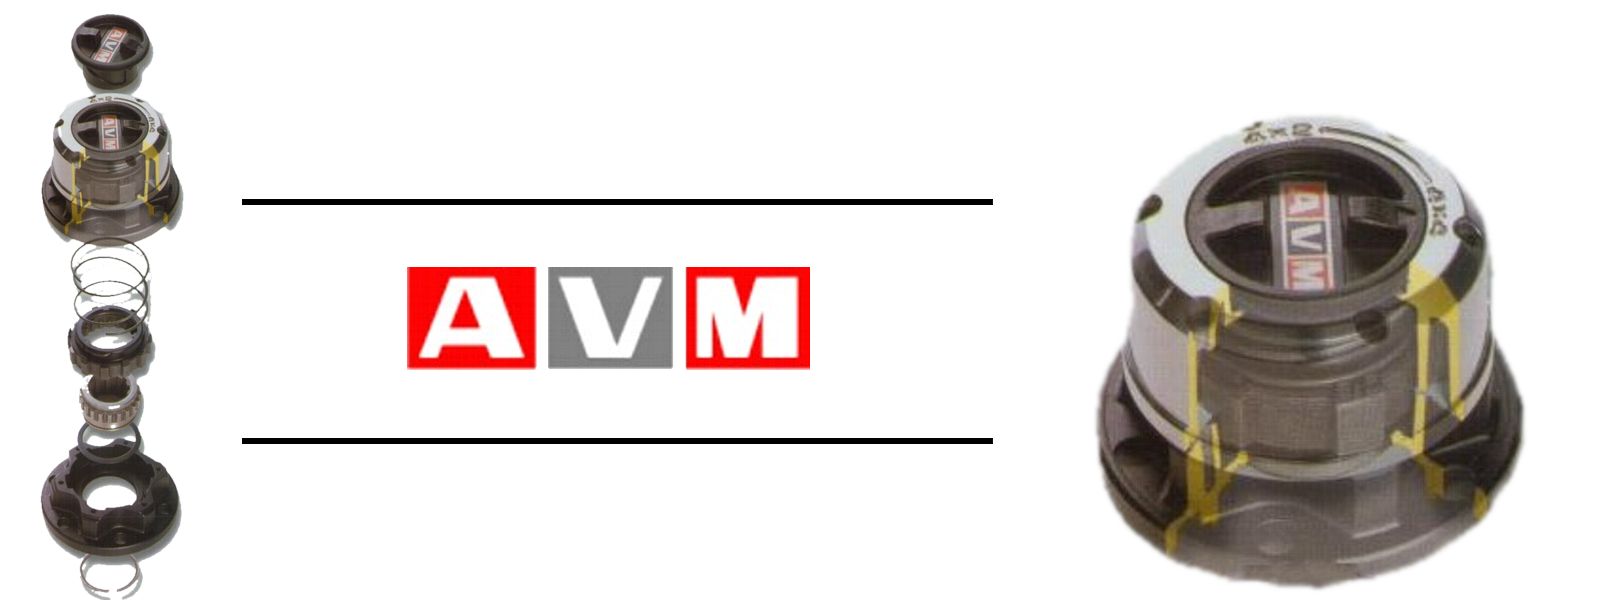 avm_menu_8